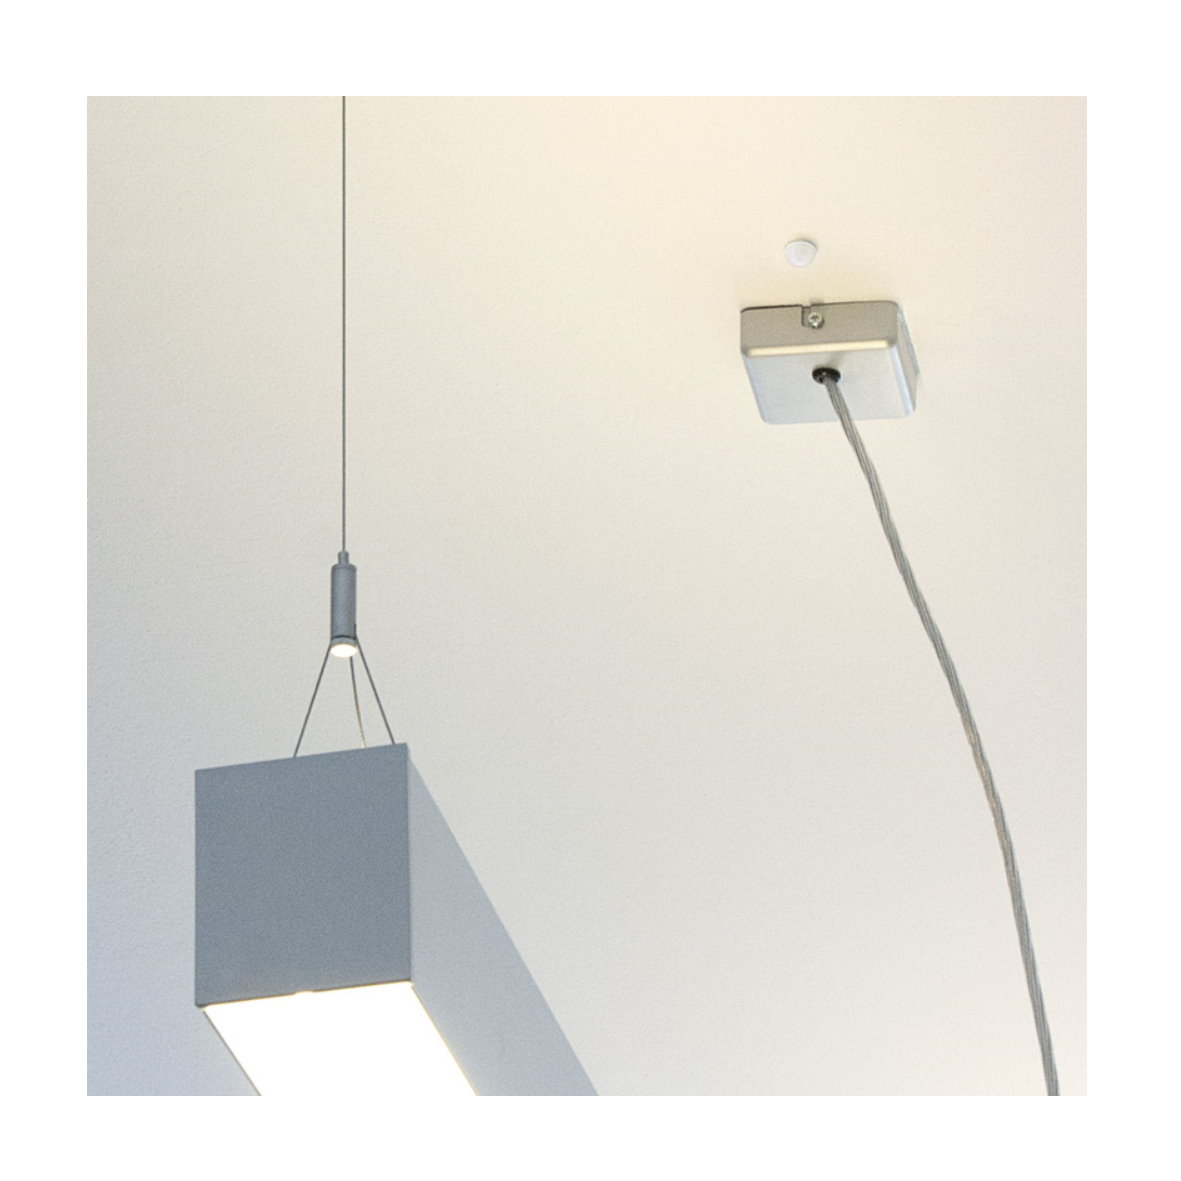 bewegungsmelder 360 sensor au en einbau led decke wand. Black Bedroom Furniture Sets. Home Design Ideas